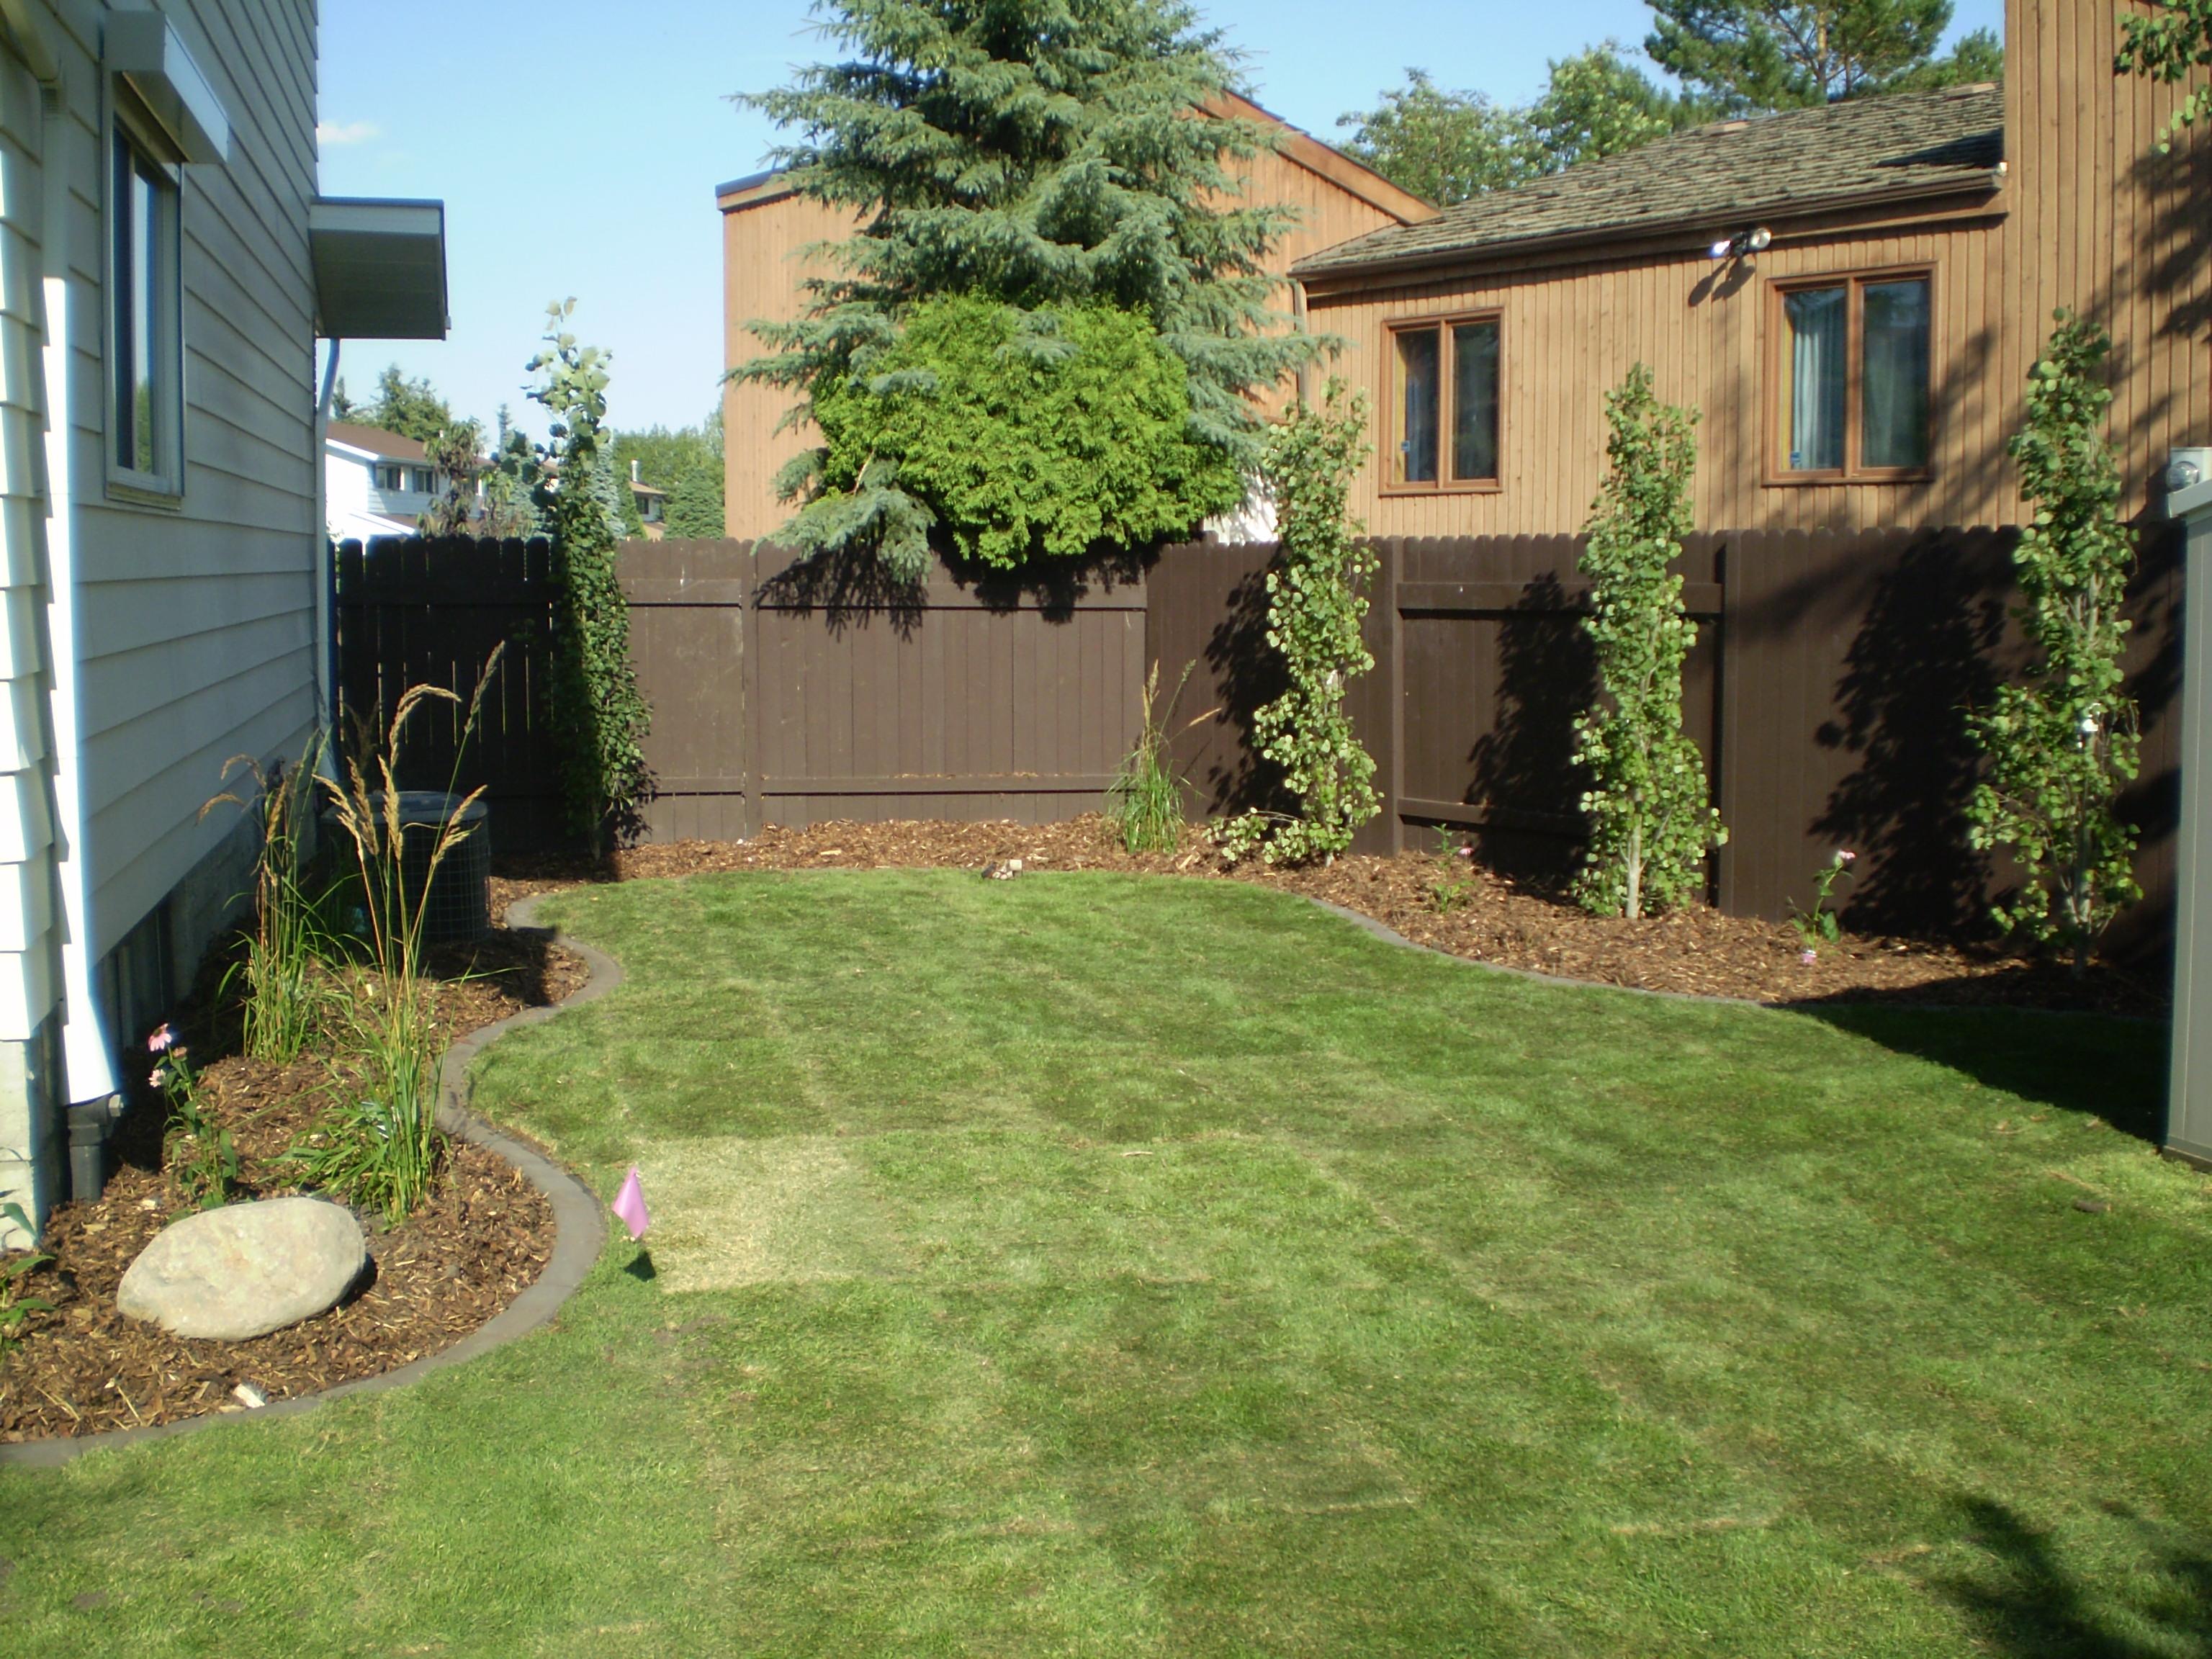 Landscaping Plans Edmonton : Landscaping and garden center edmonton alberta